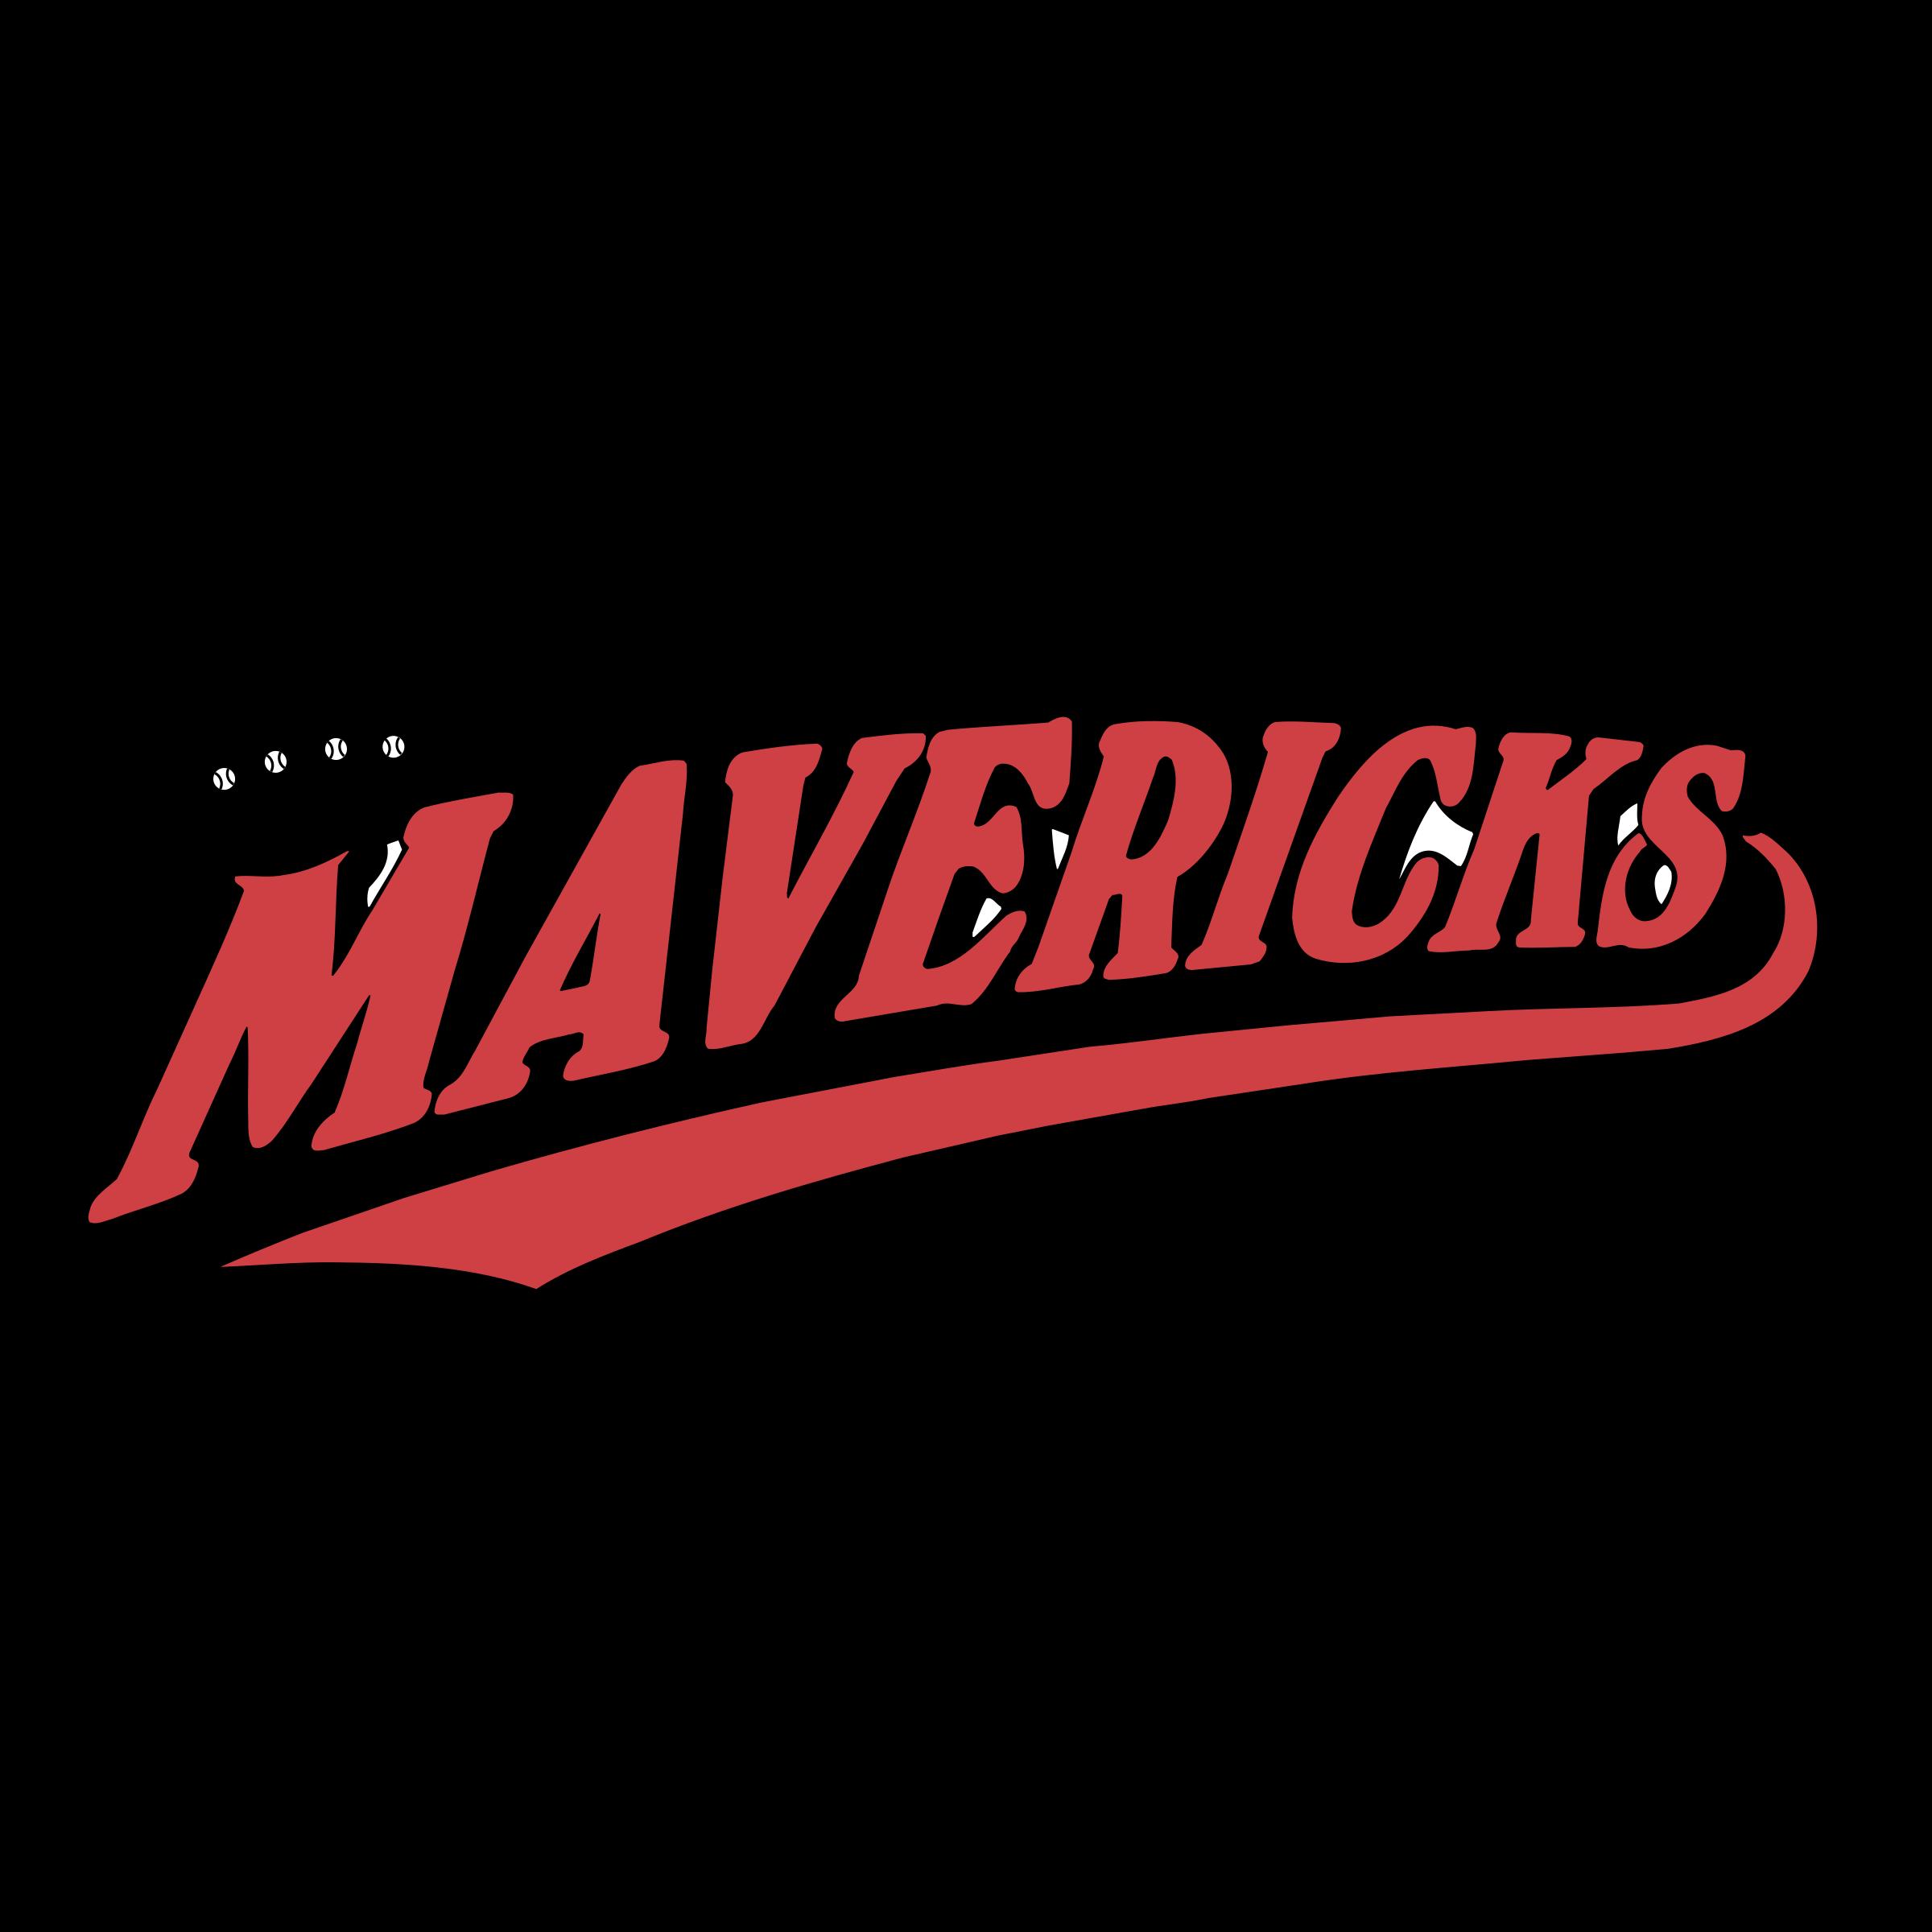 Desert clipart svg. High mavericks logo png